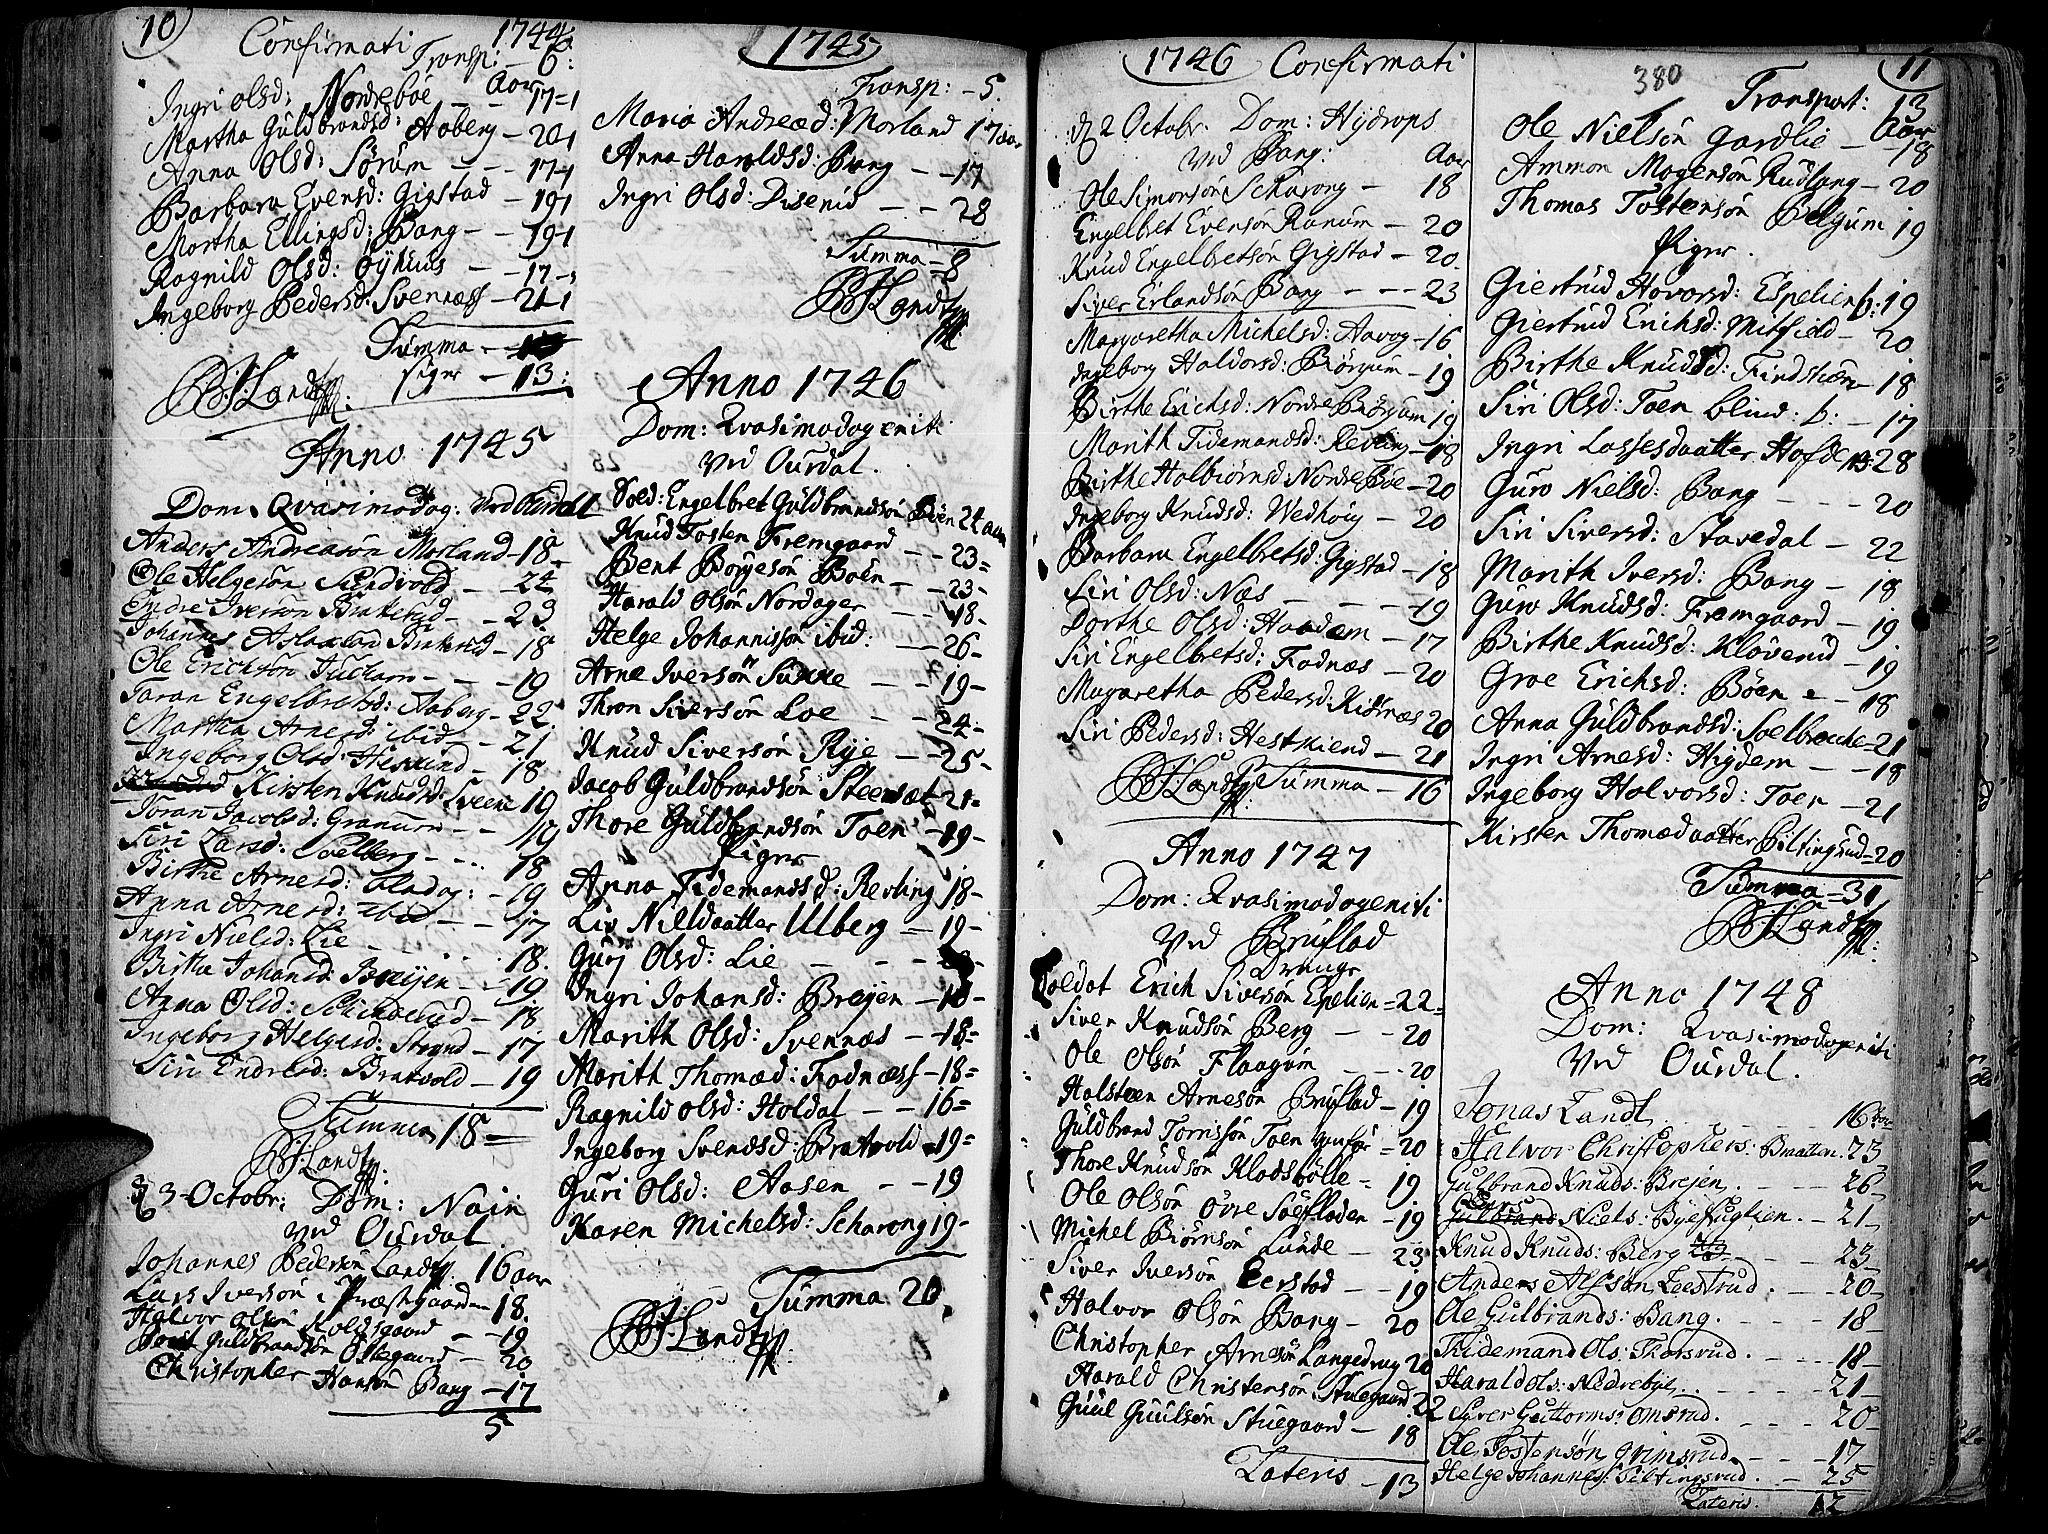 SAH, Aurdal prestekontor, Ministerialbok nr. 4, 1730-1762, s. 10-11